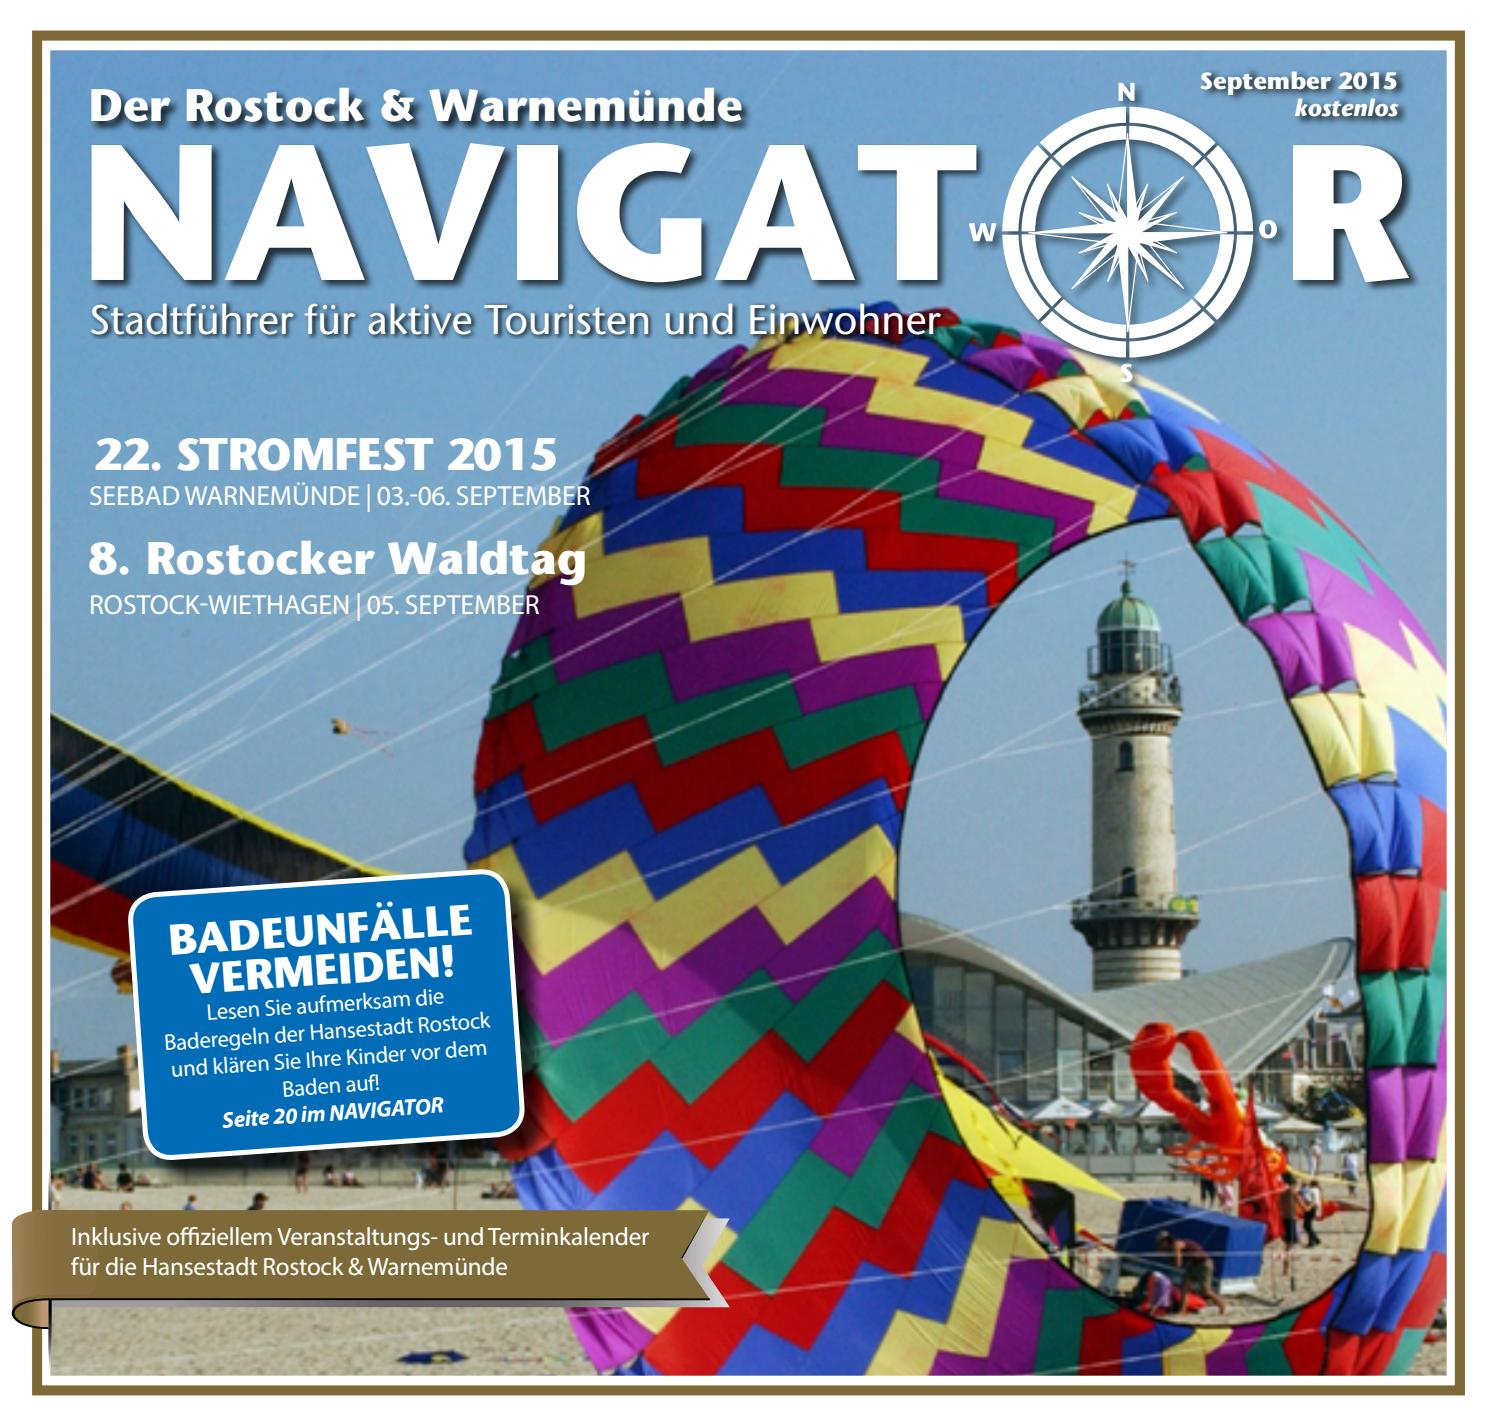 Navigator_september_2015 by taurus werbeagentur - issuu